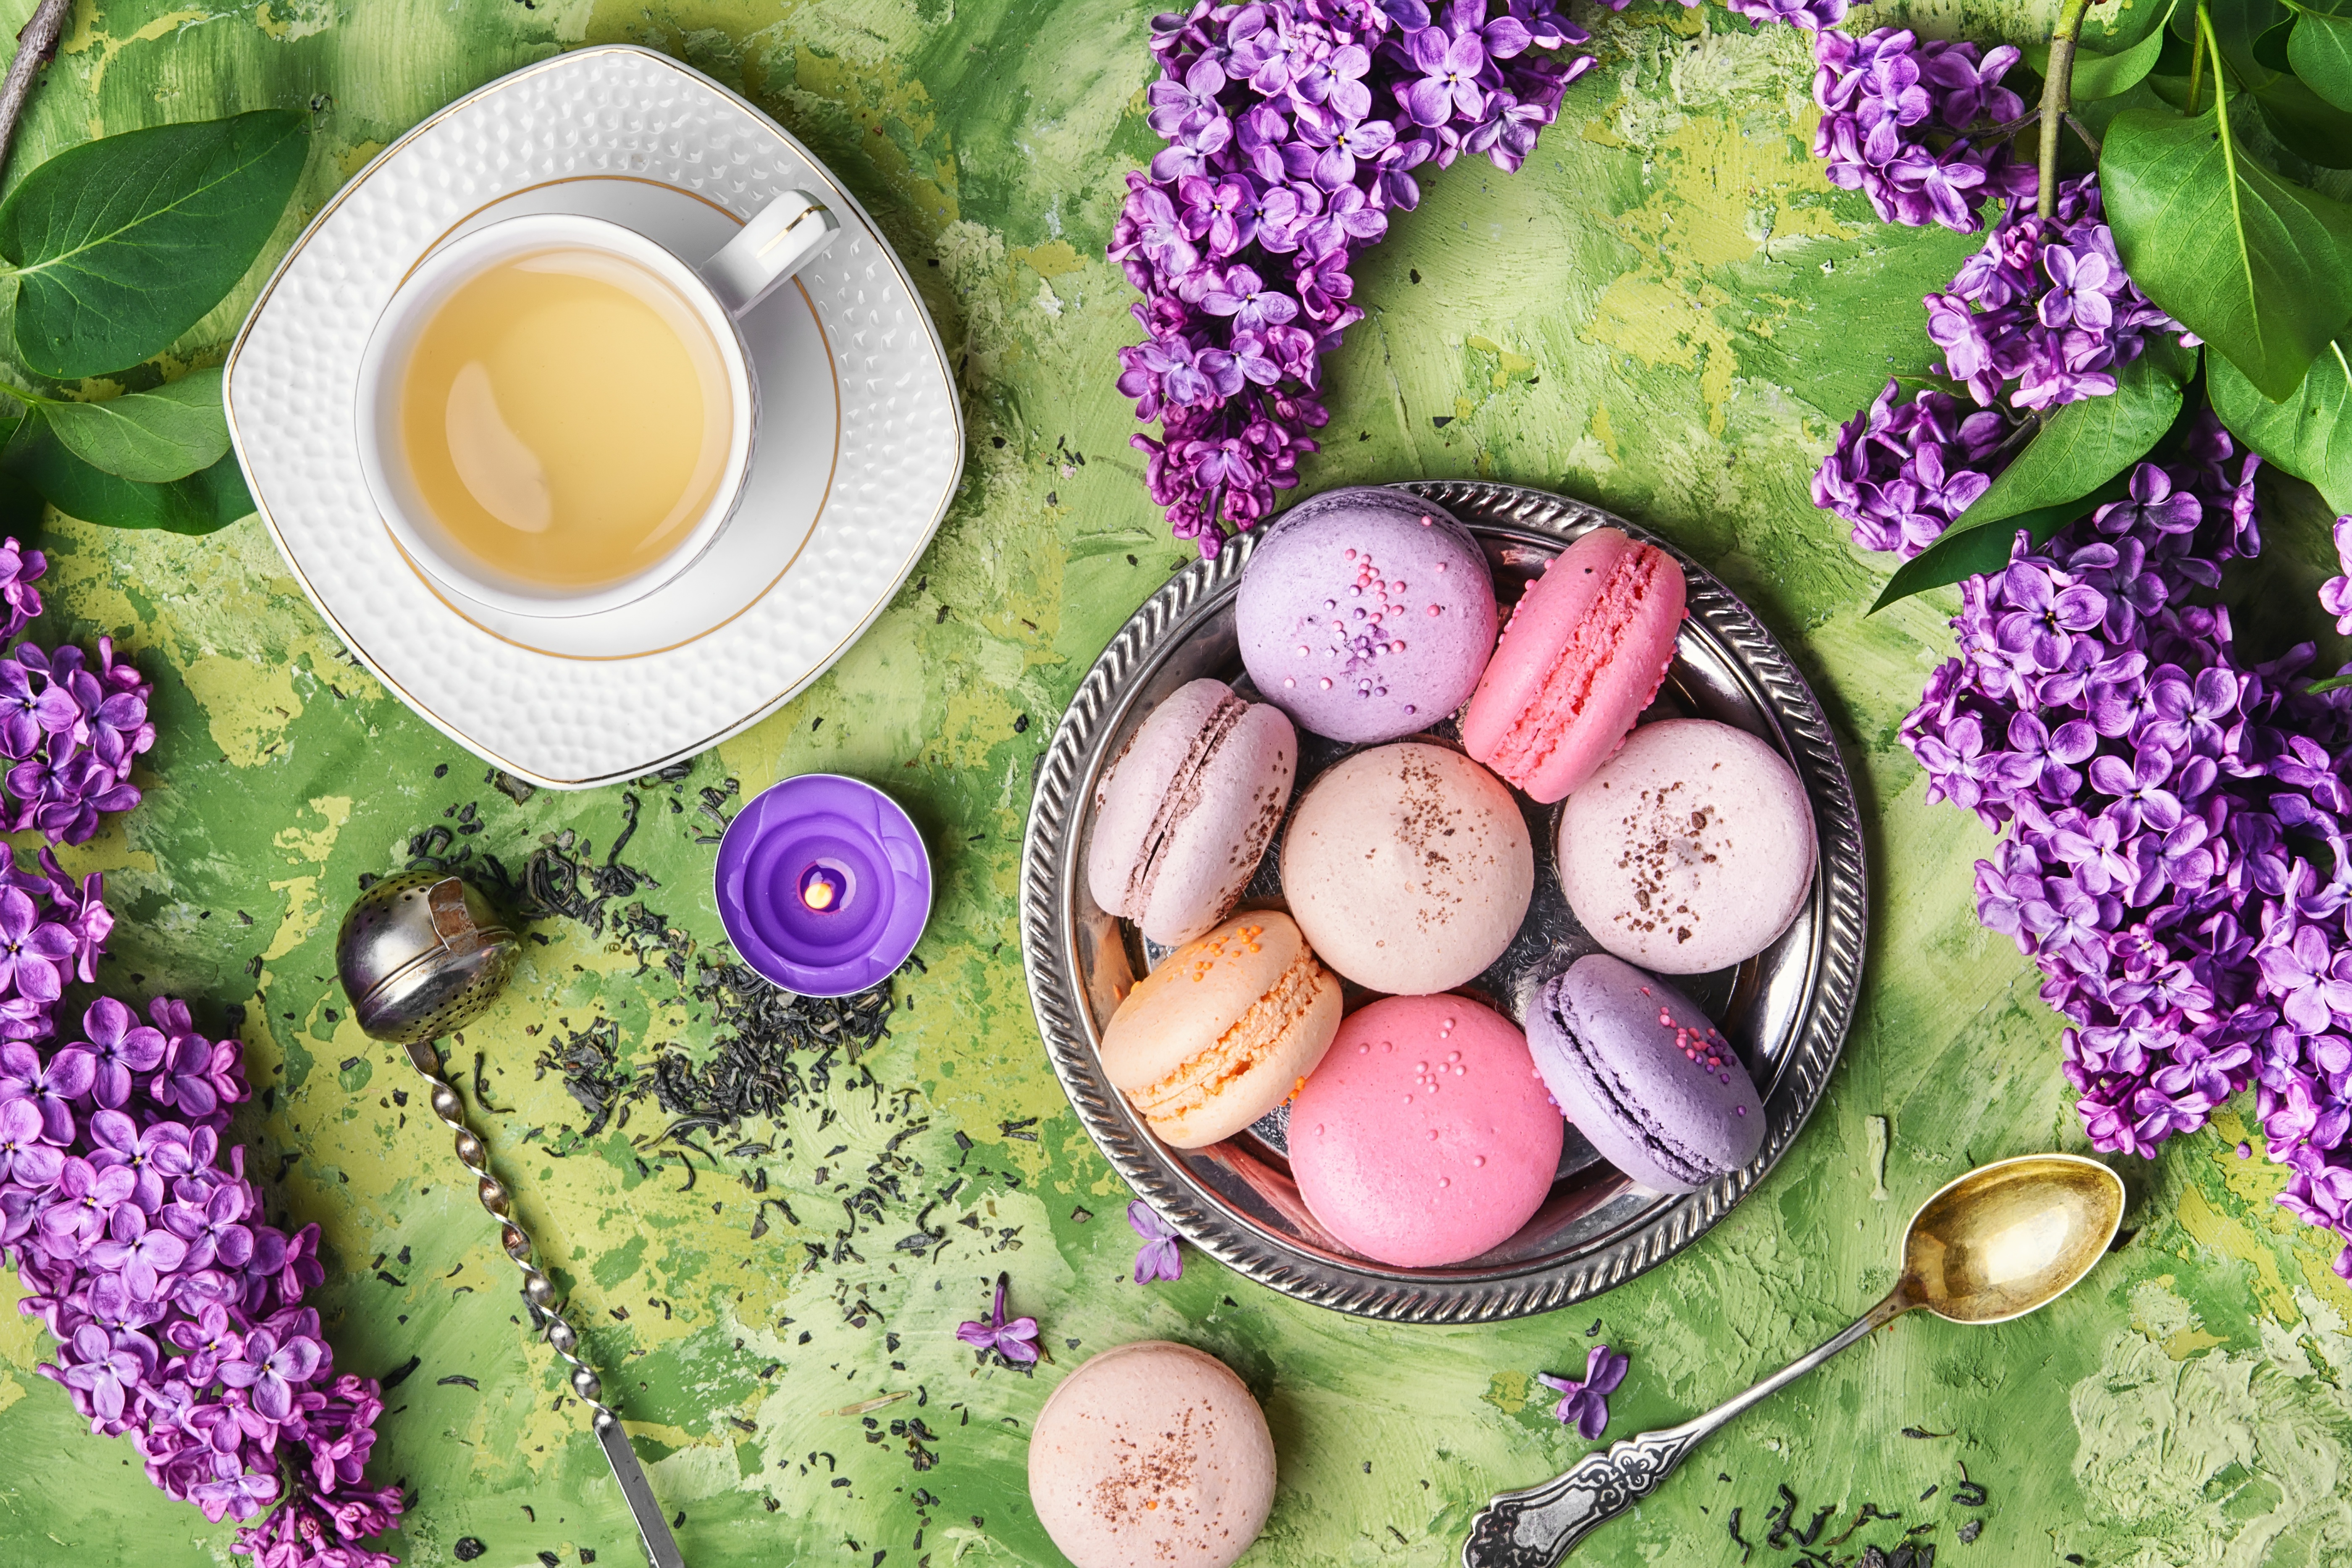 Cup Flower Lilac Macaron Still Life Tea 5600x3733